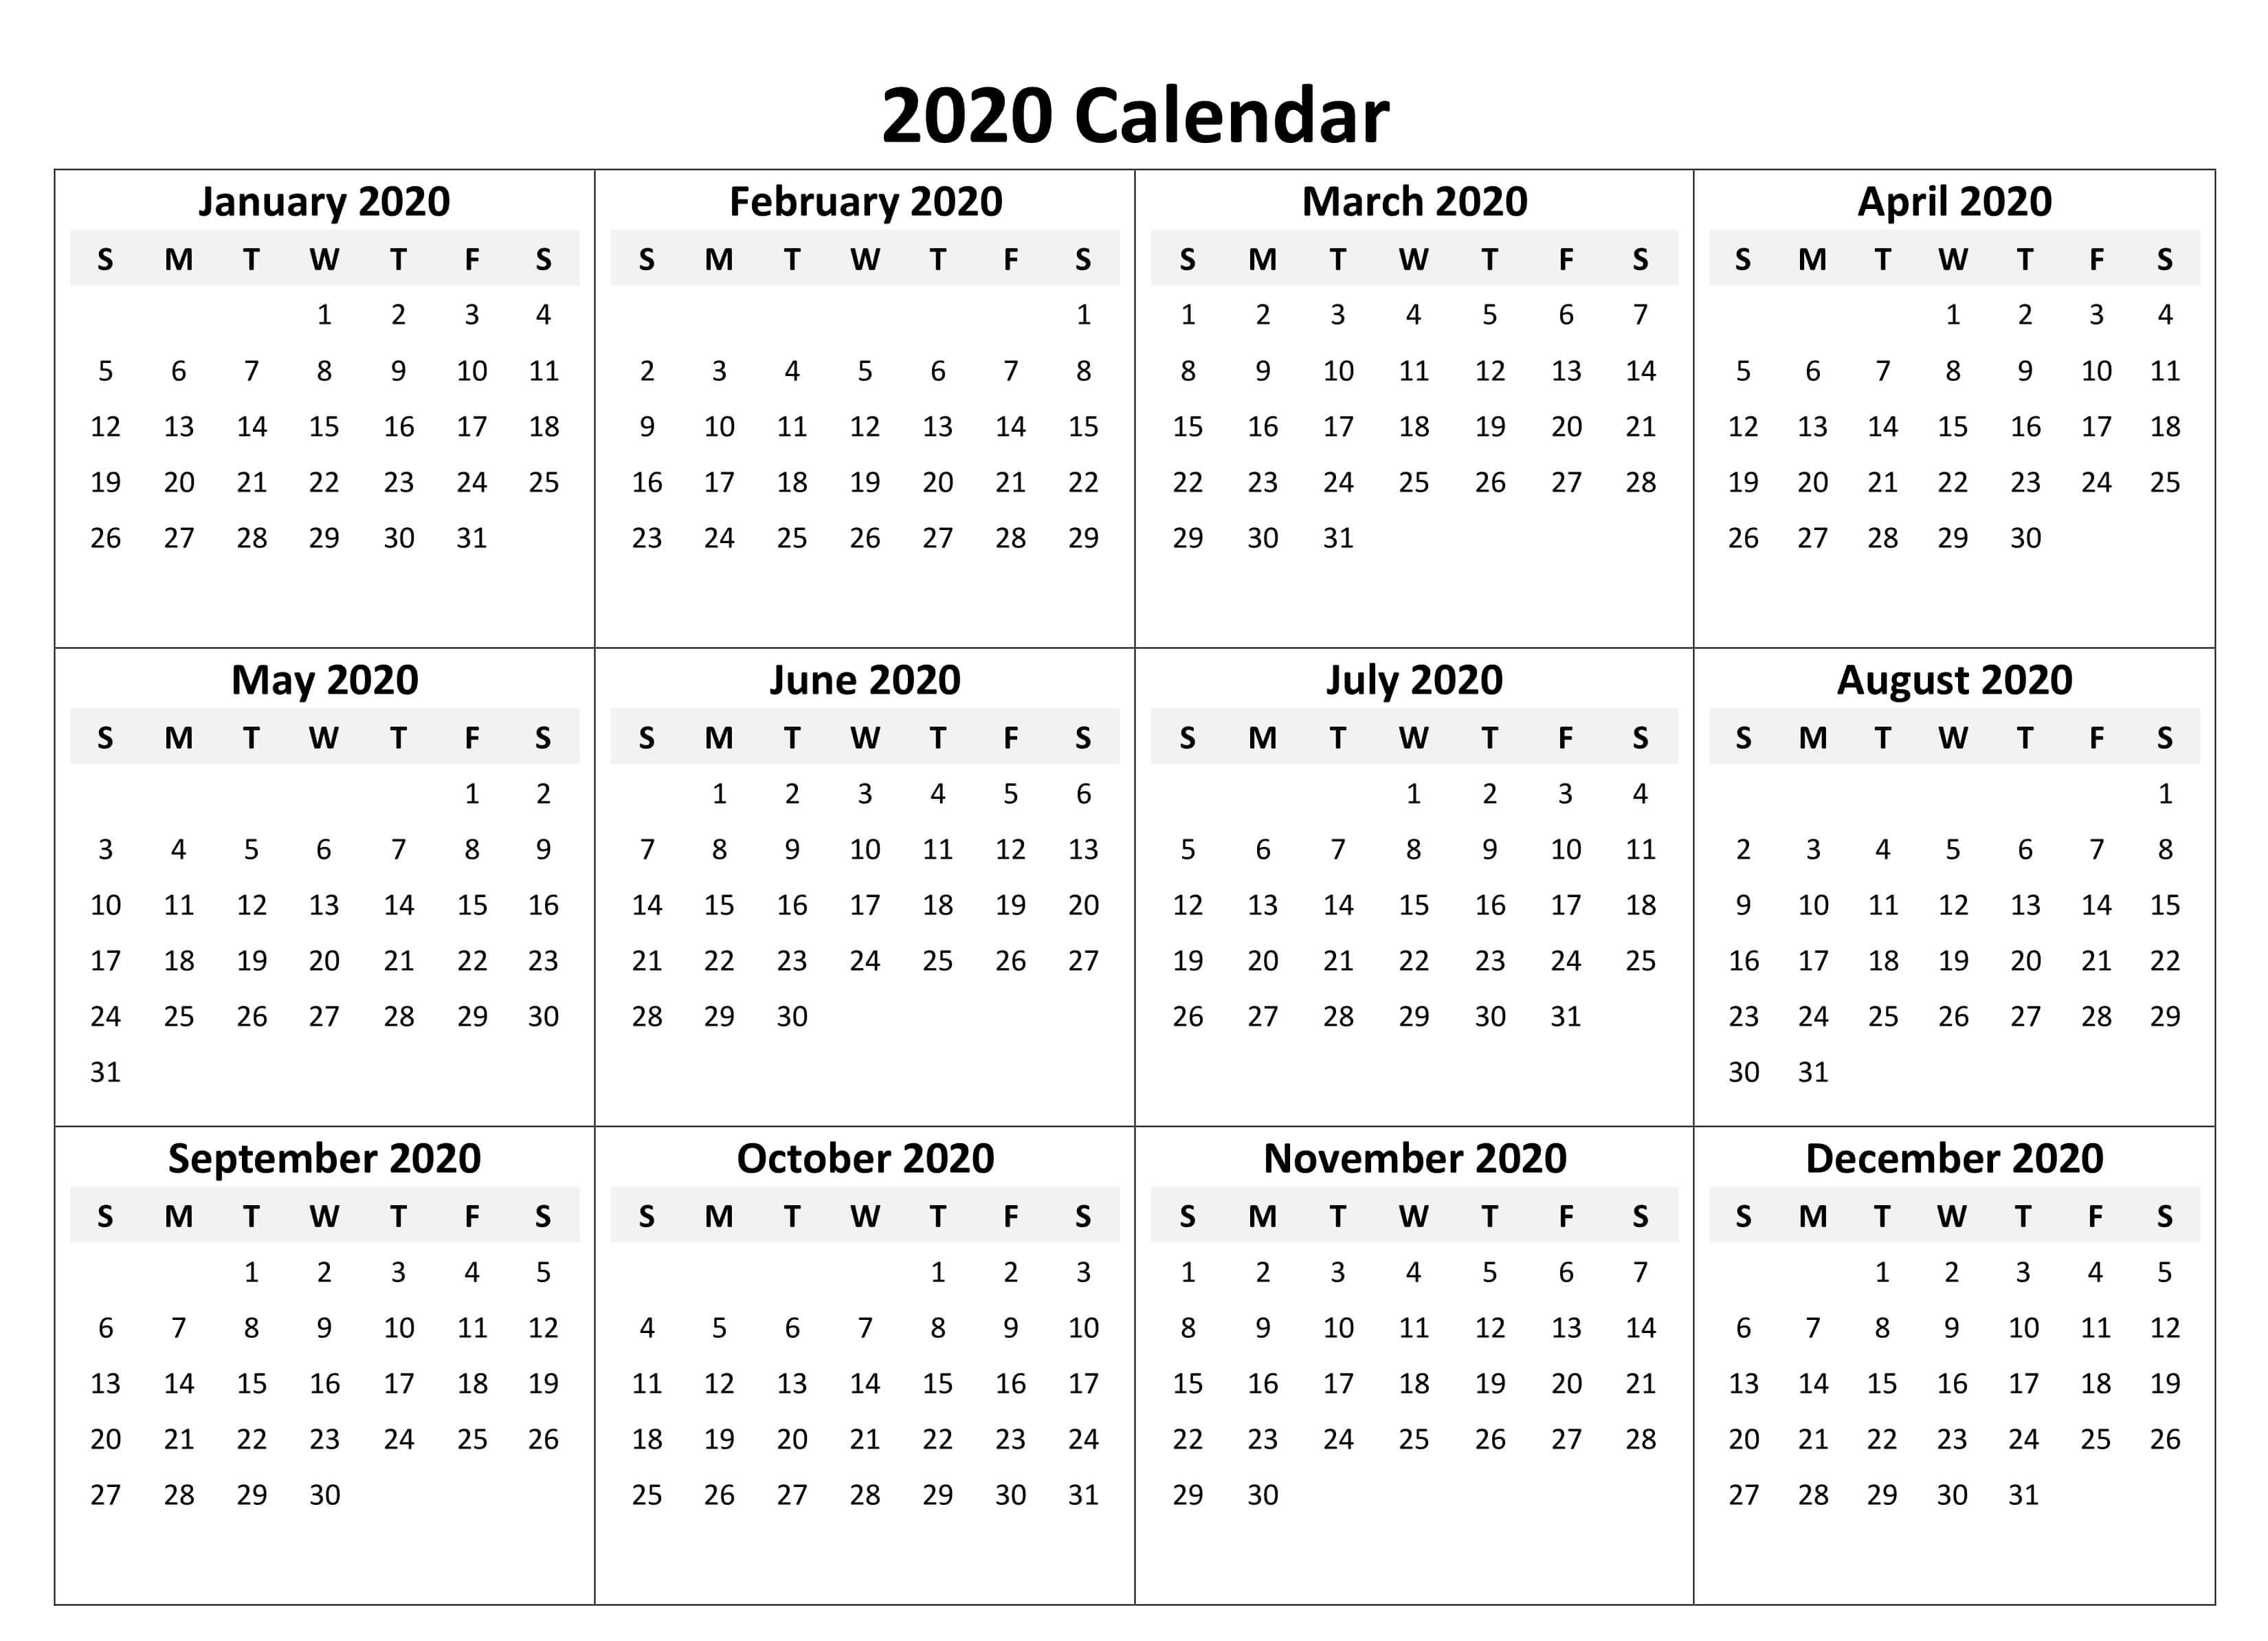 Printable Calendar 2020 With Notes - 2019 Calendars For regarding Calendar At A Glance With Usa Holidays For 2020